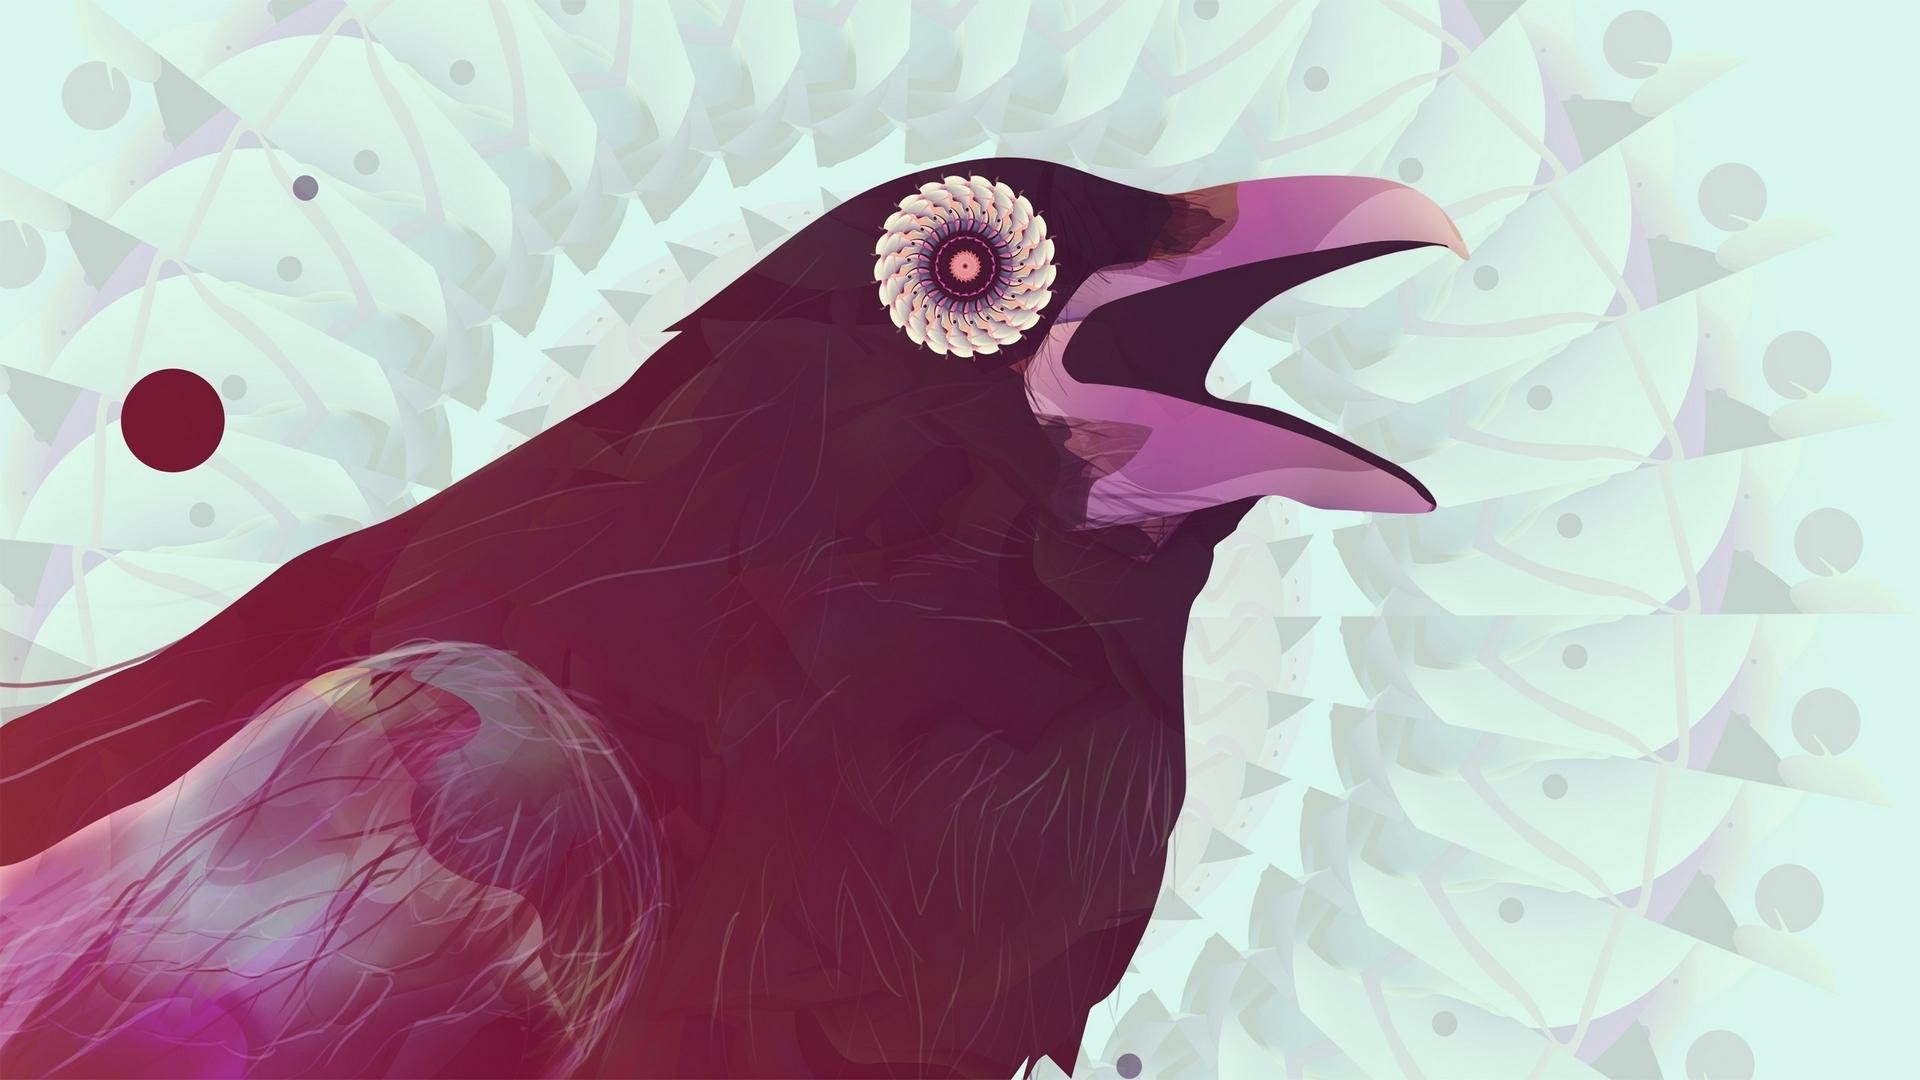 Animal Raven 1920x1080